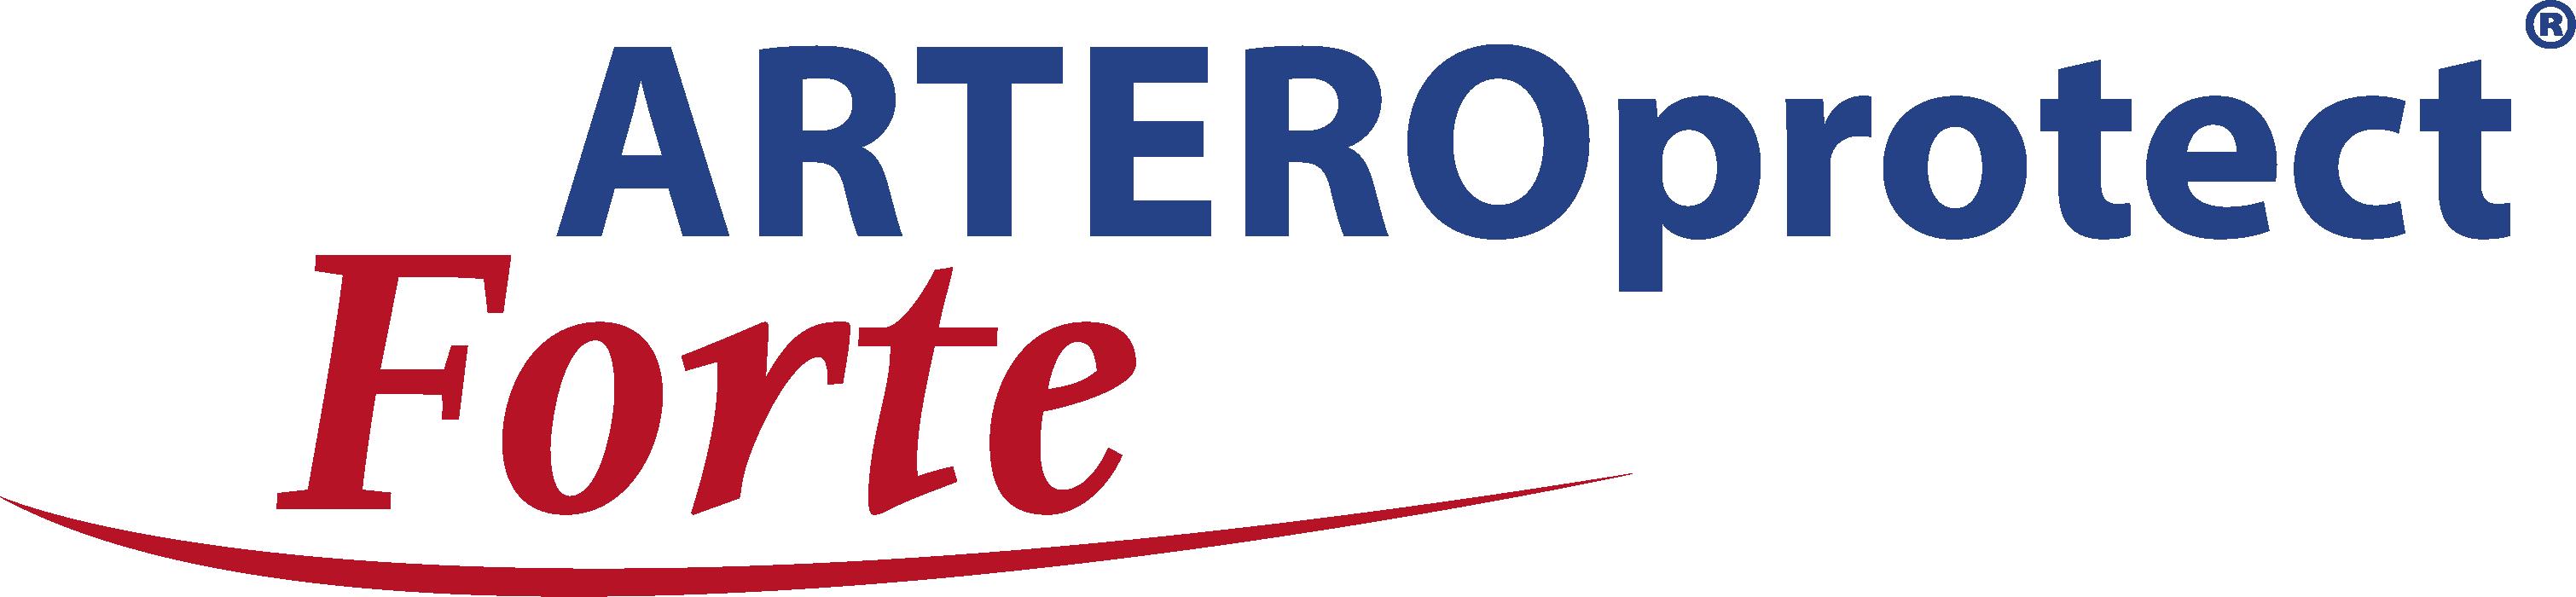 ArteroProtect FORTE